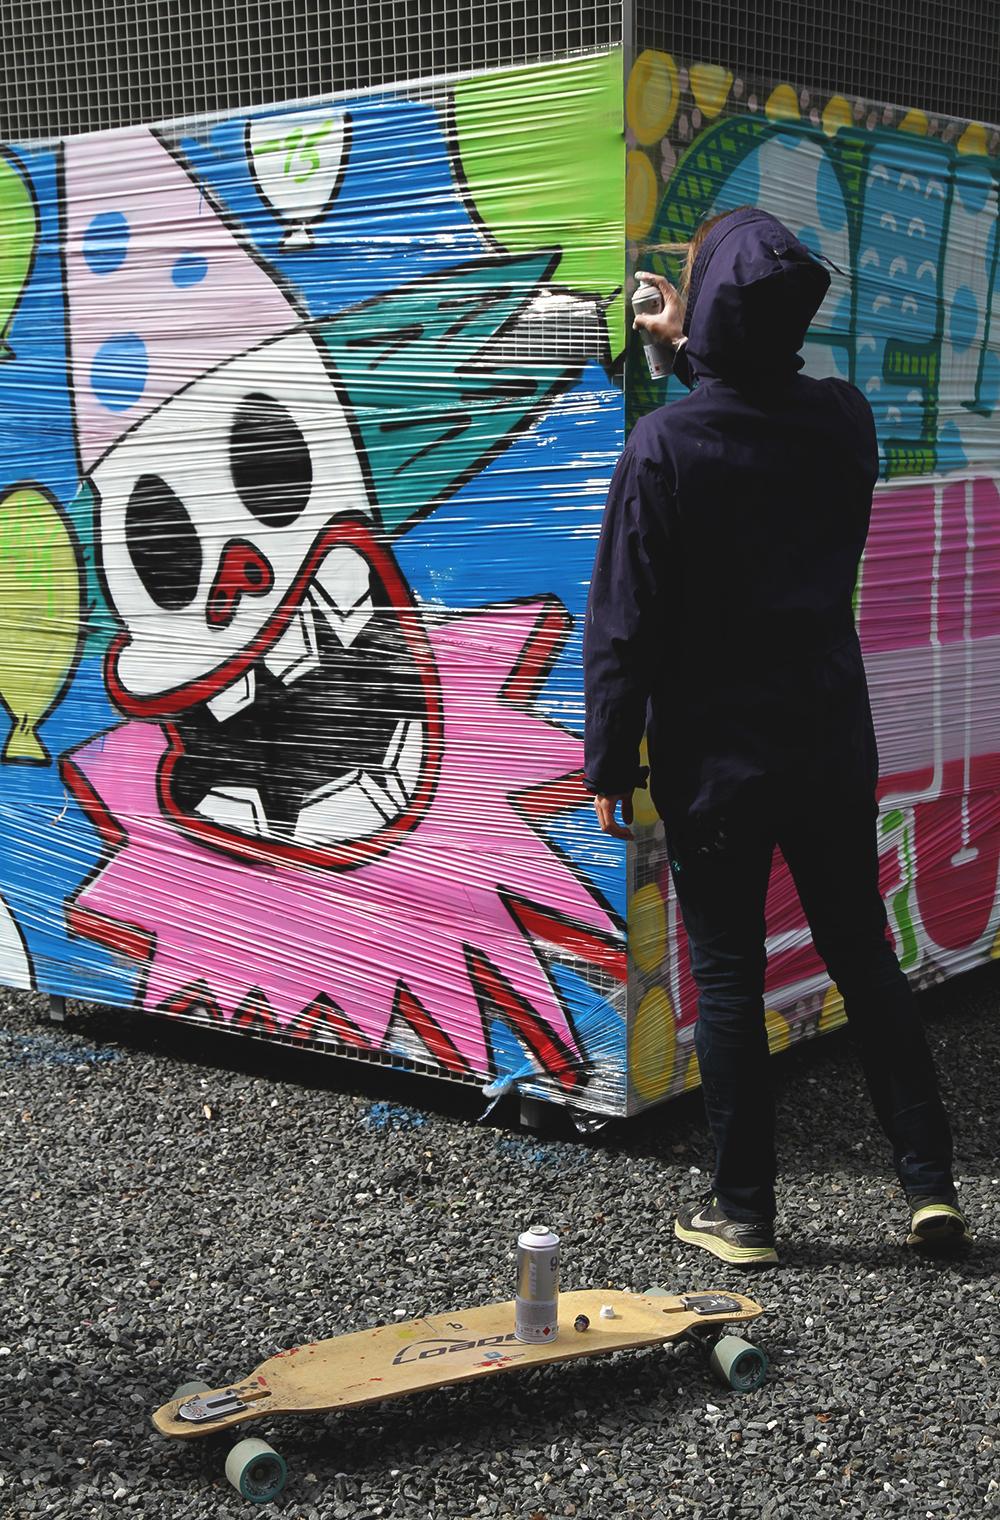 hunajaista verkatehdas vappu graffitit pelle